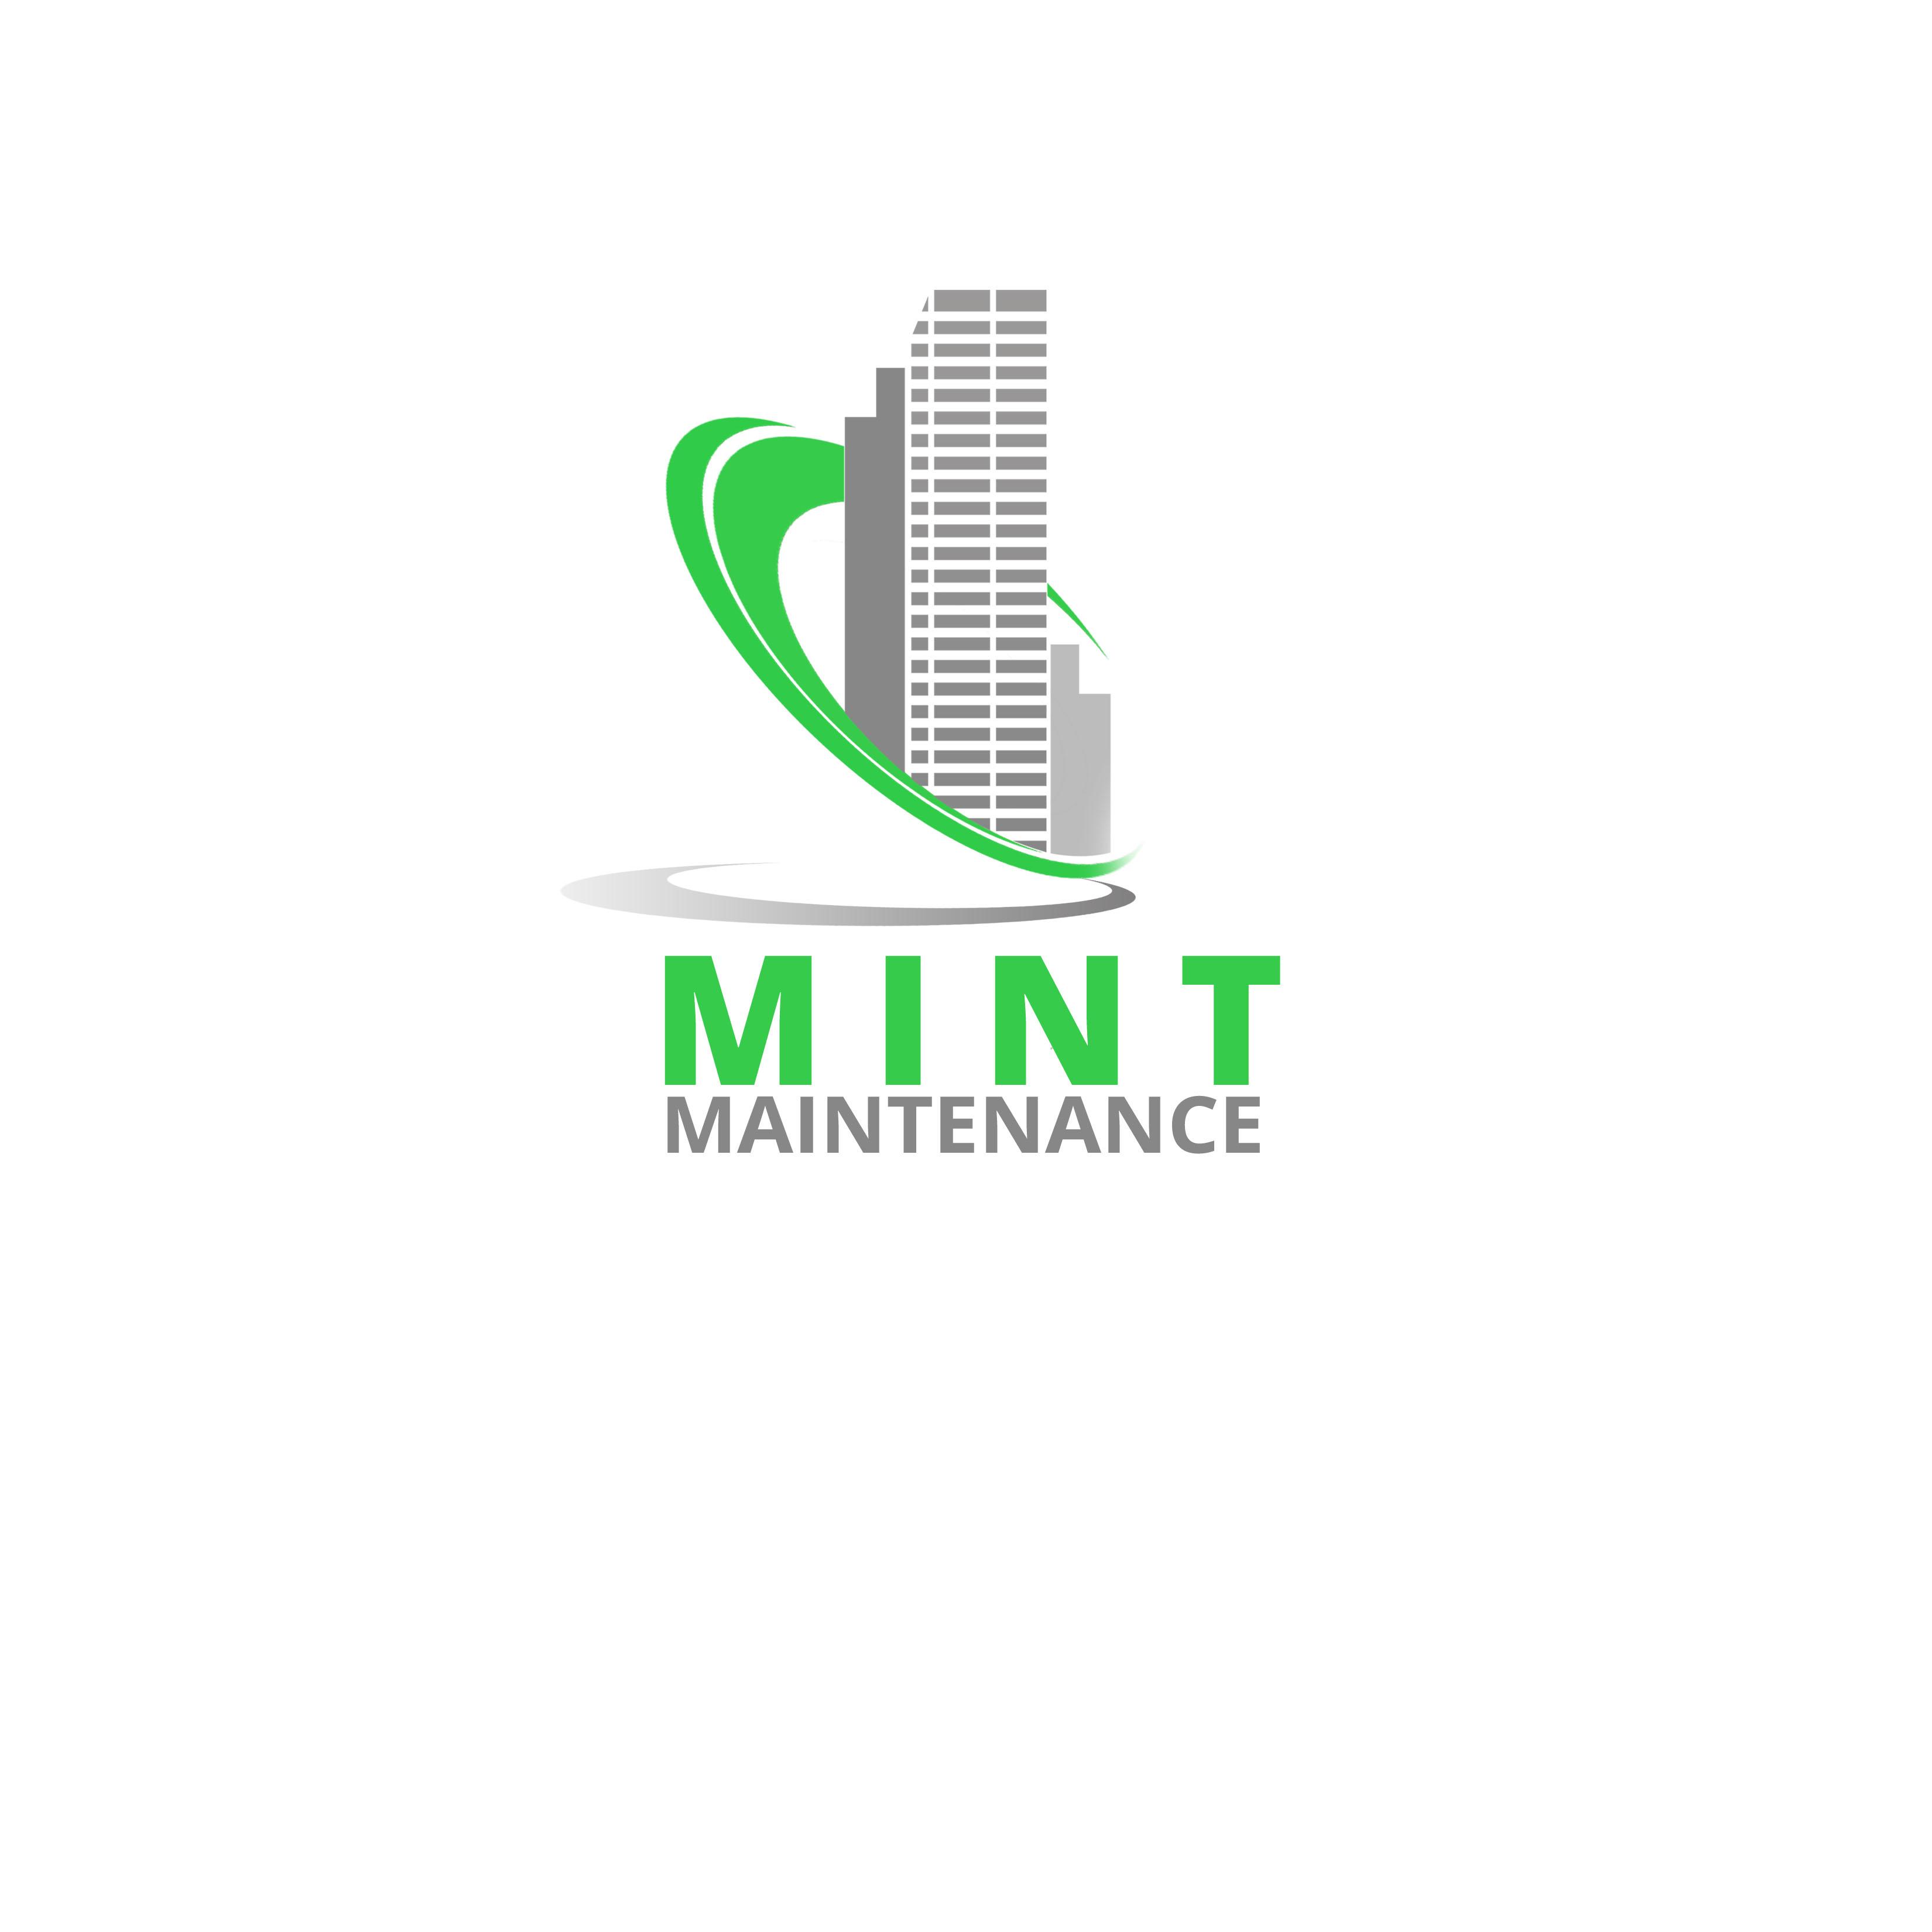 Logo Design by Allan Esclamado - Entry No. 173 in the Logo Design Contest Creative Logo Design for Mint Maintenance.